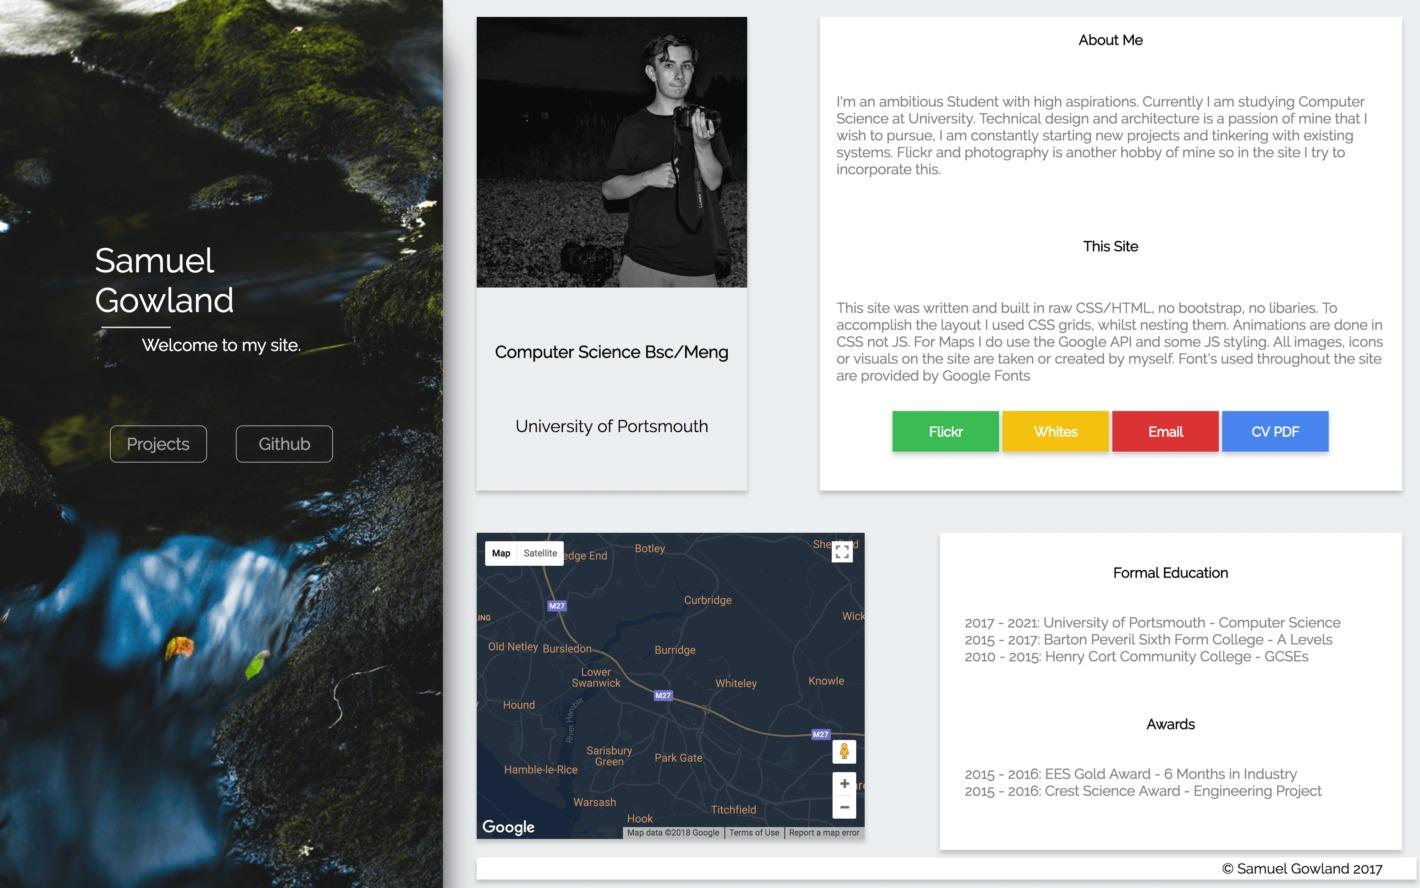 Samuel Gowlan's personal website.